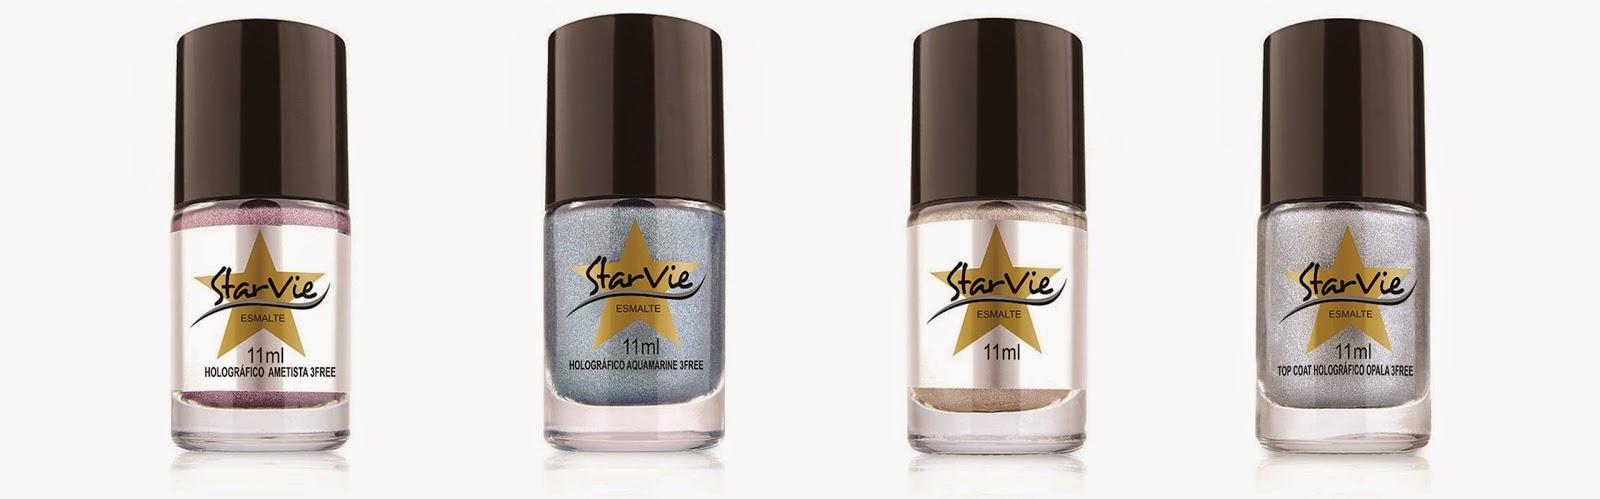 Lançamentos StarVie Beauty Fair 2014